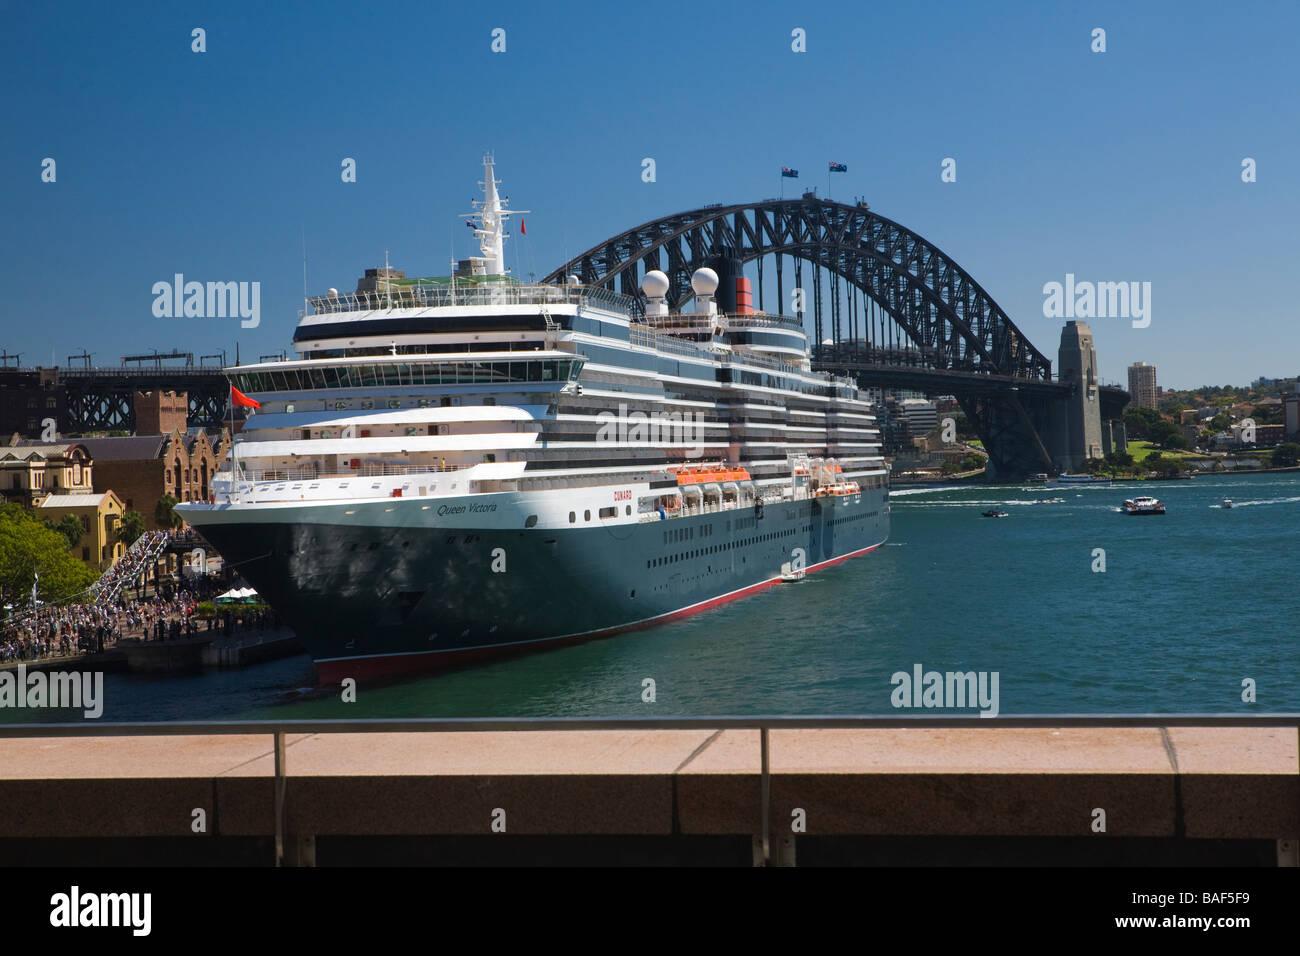 Queen Victoria cruise ship at Overseas Passenger Terminal, circular Quay, Sydney, New South Wales, Australia - Stock Image